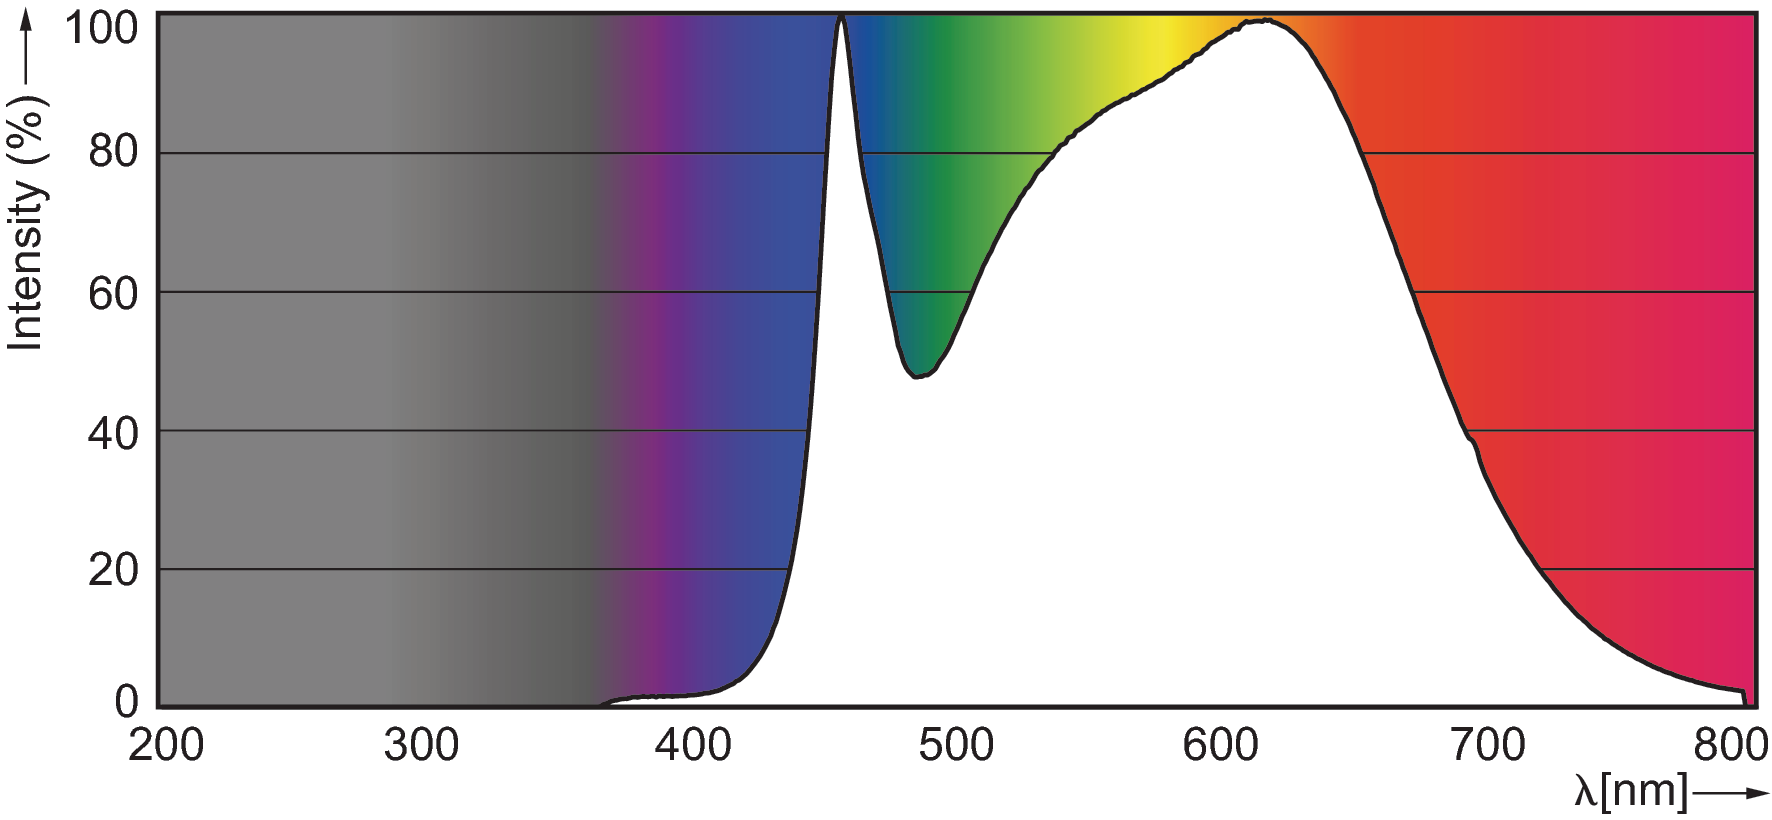 Diy Light Therapy Light Sunlight Simulation Sad Light